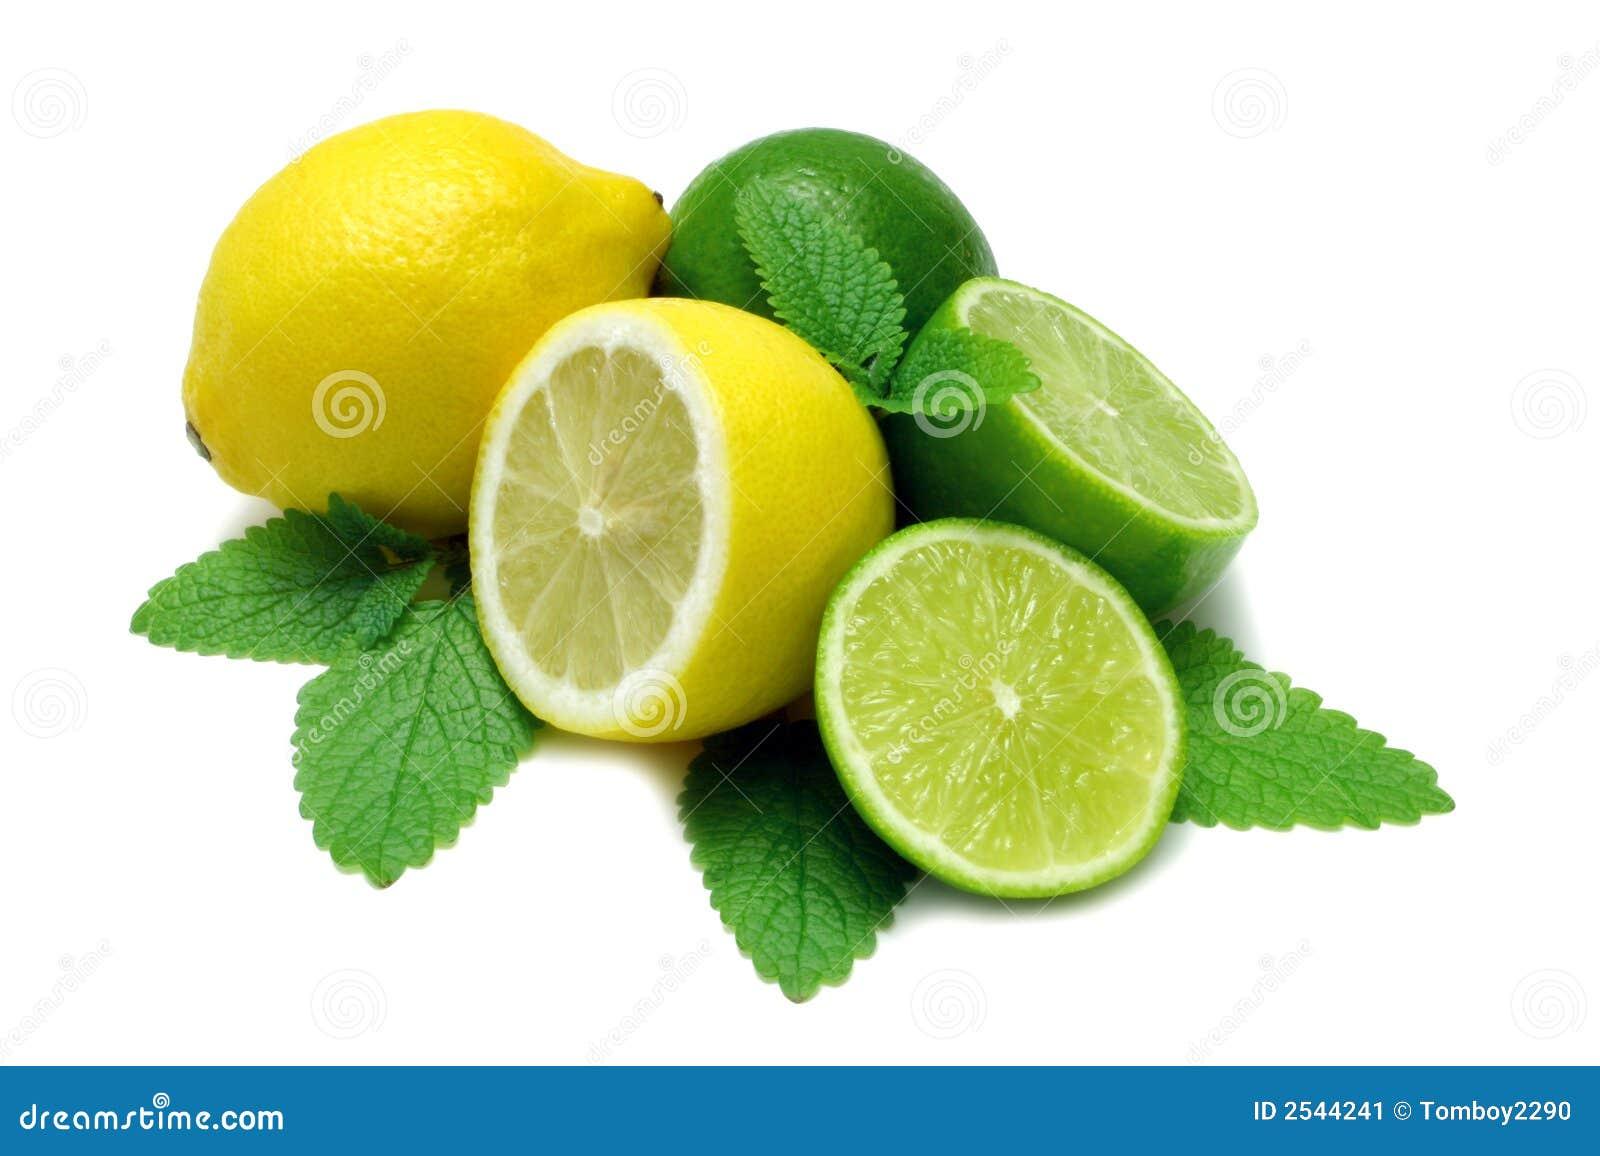 lemon and limes stock image image 2544241 watercolor green leaf clip art green leaf clip art border